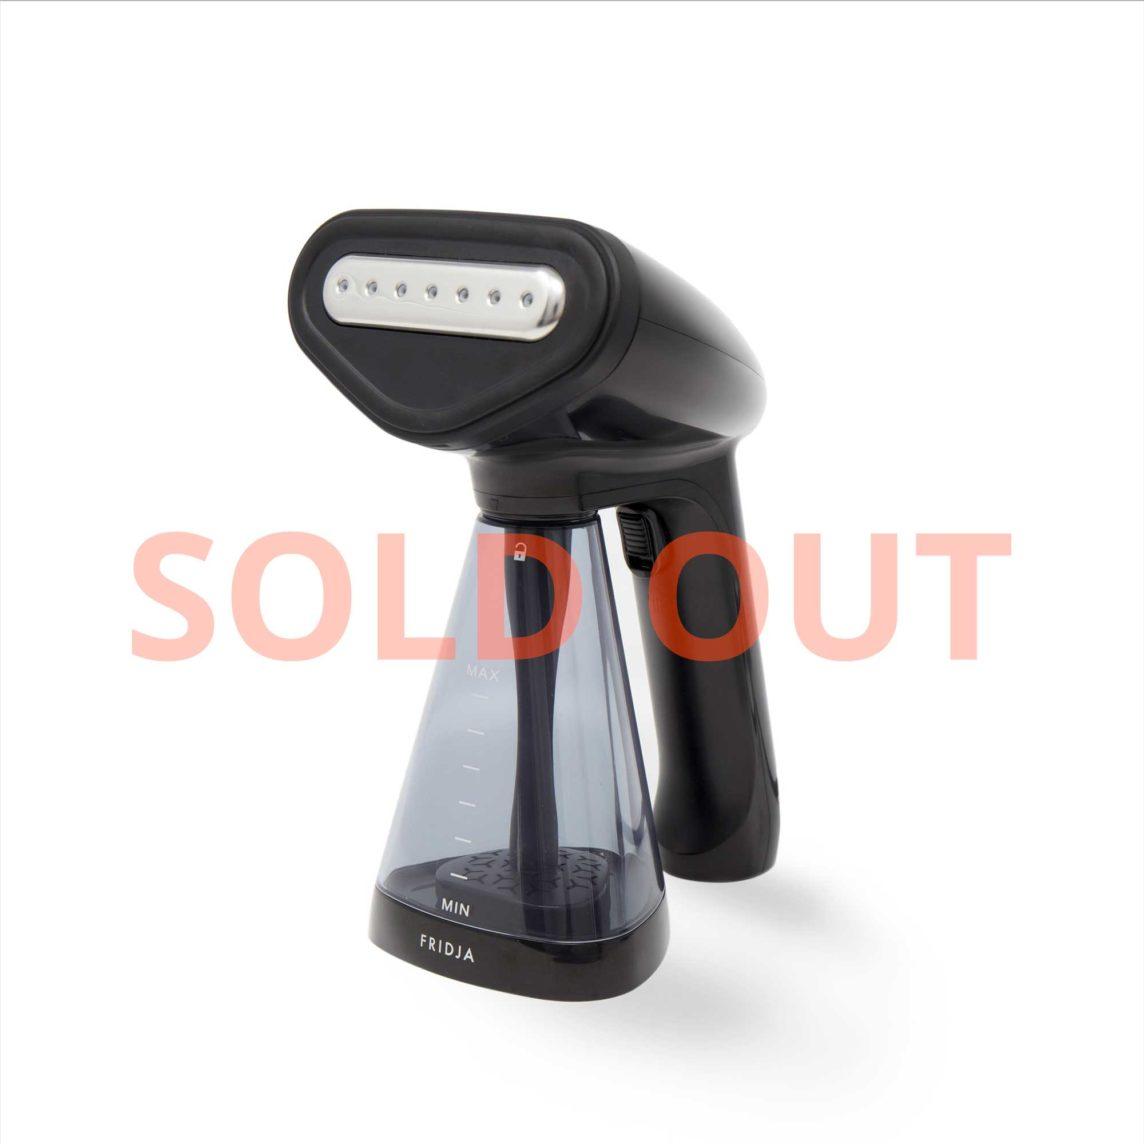 Fridja f10 Raf/Black Sold Out